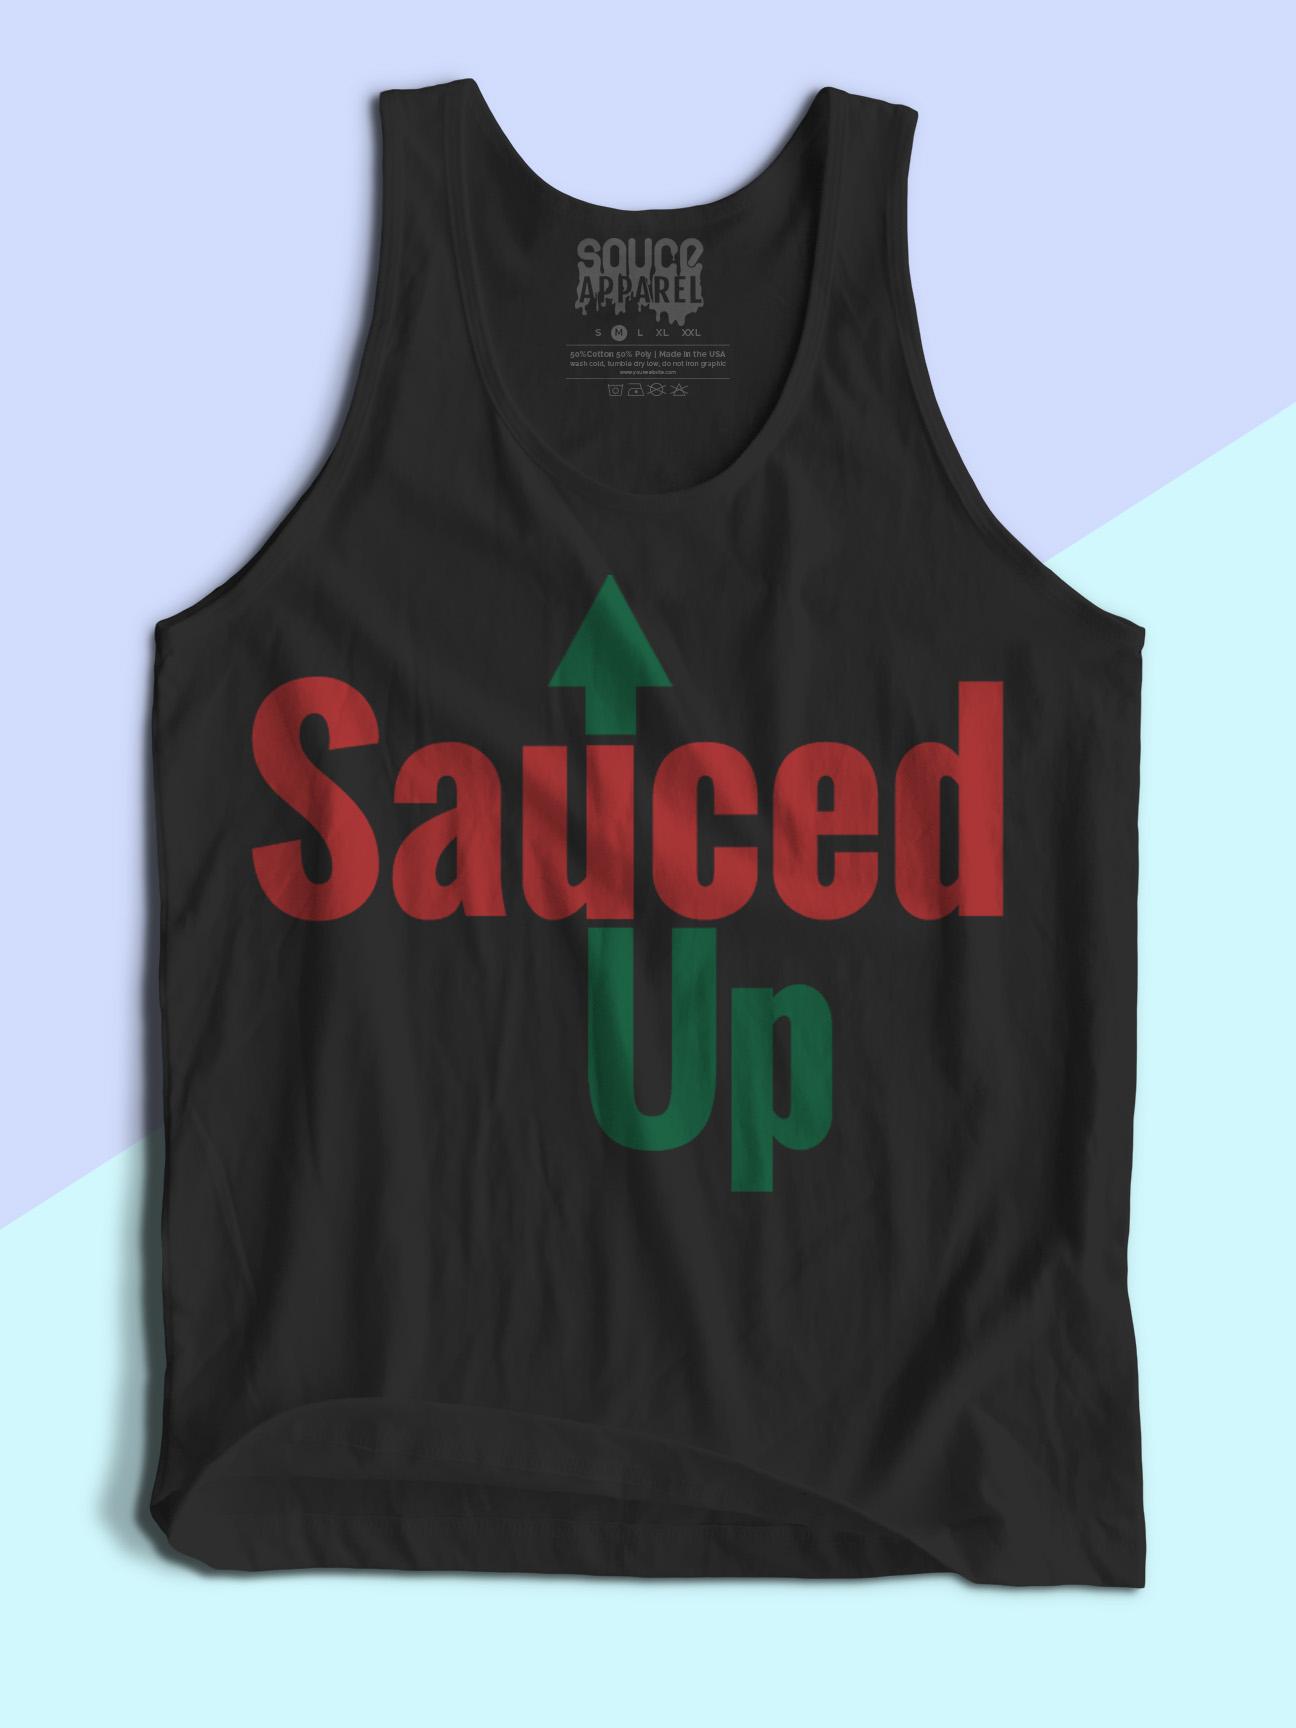 Sauced Up Tanks (Black)